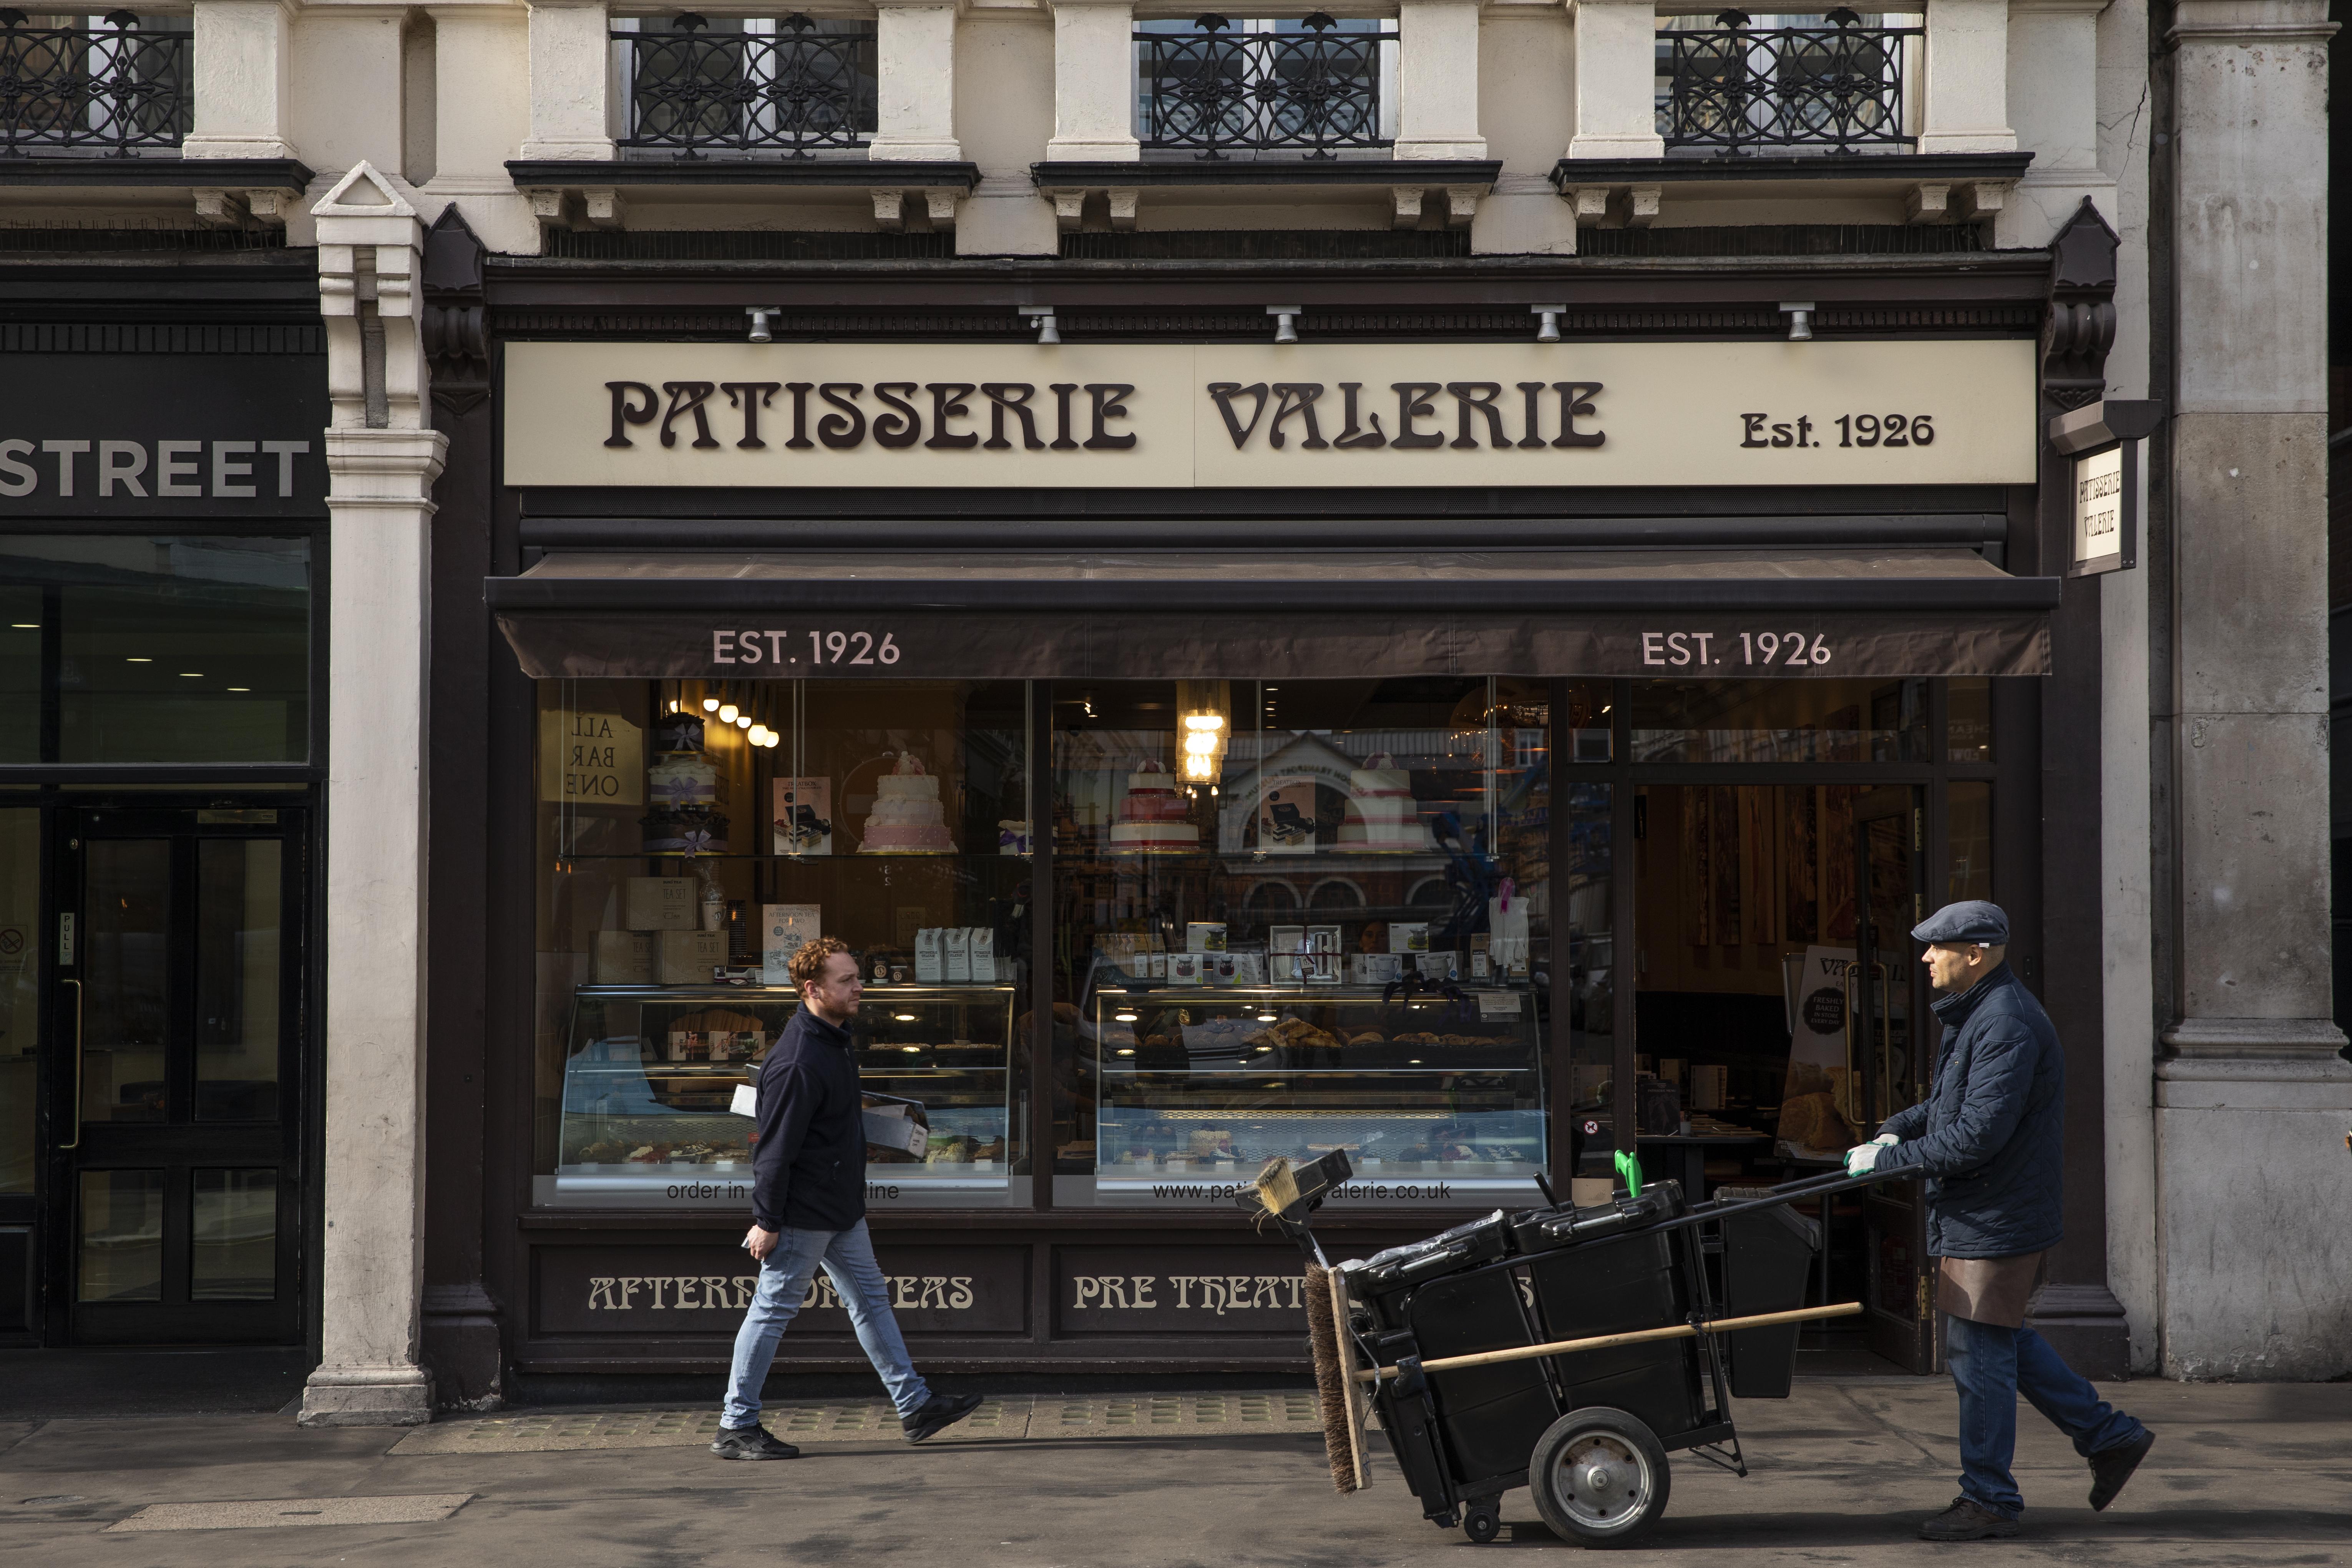 Patisserie Valerie financial investigation sees five arrests